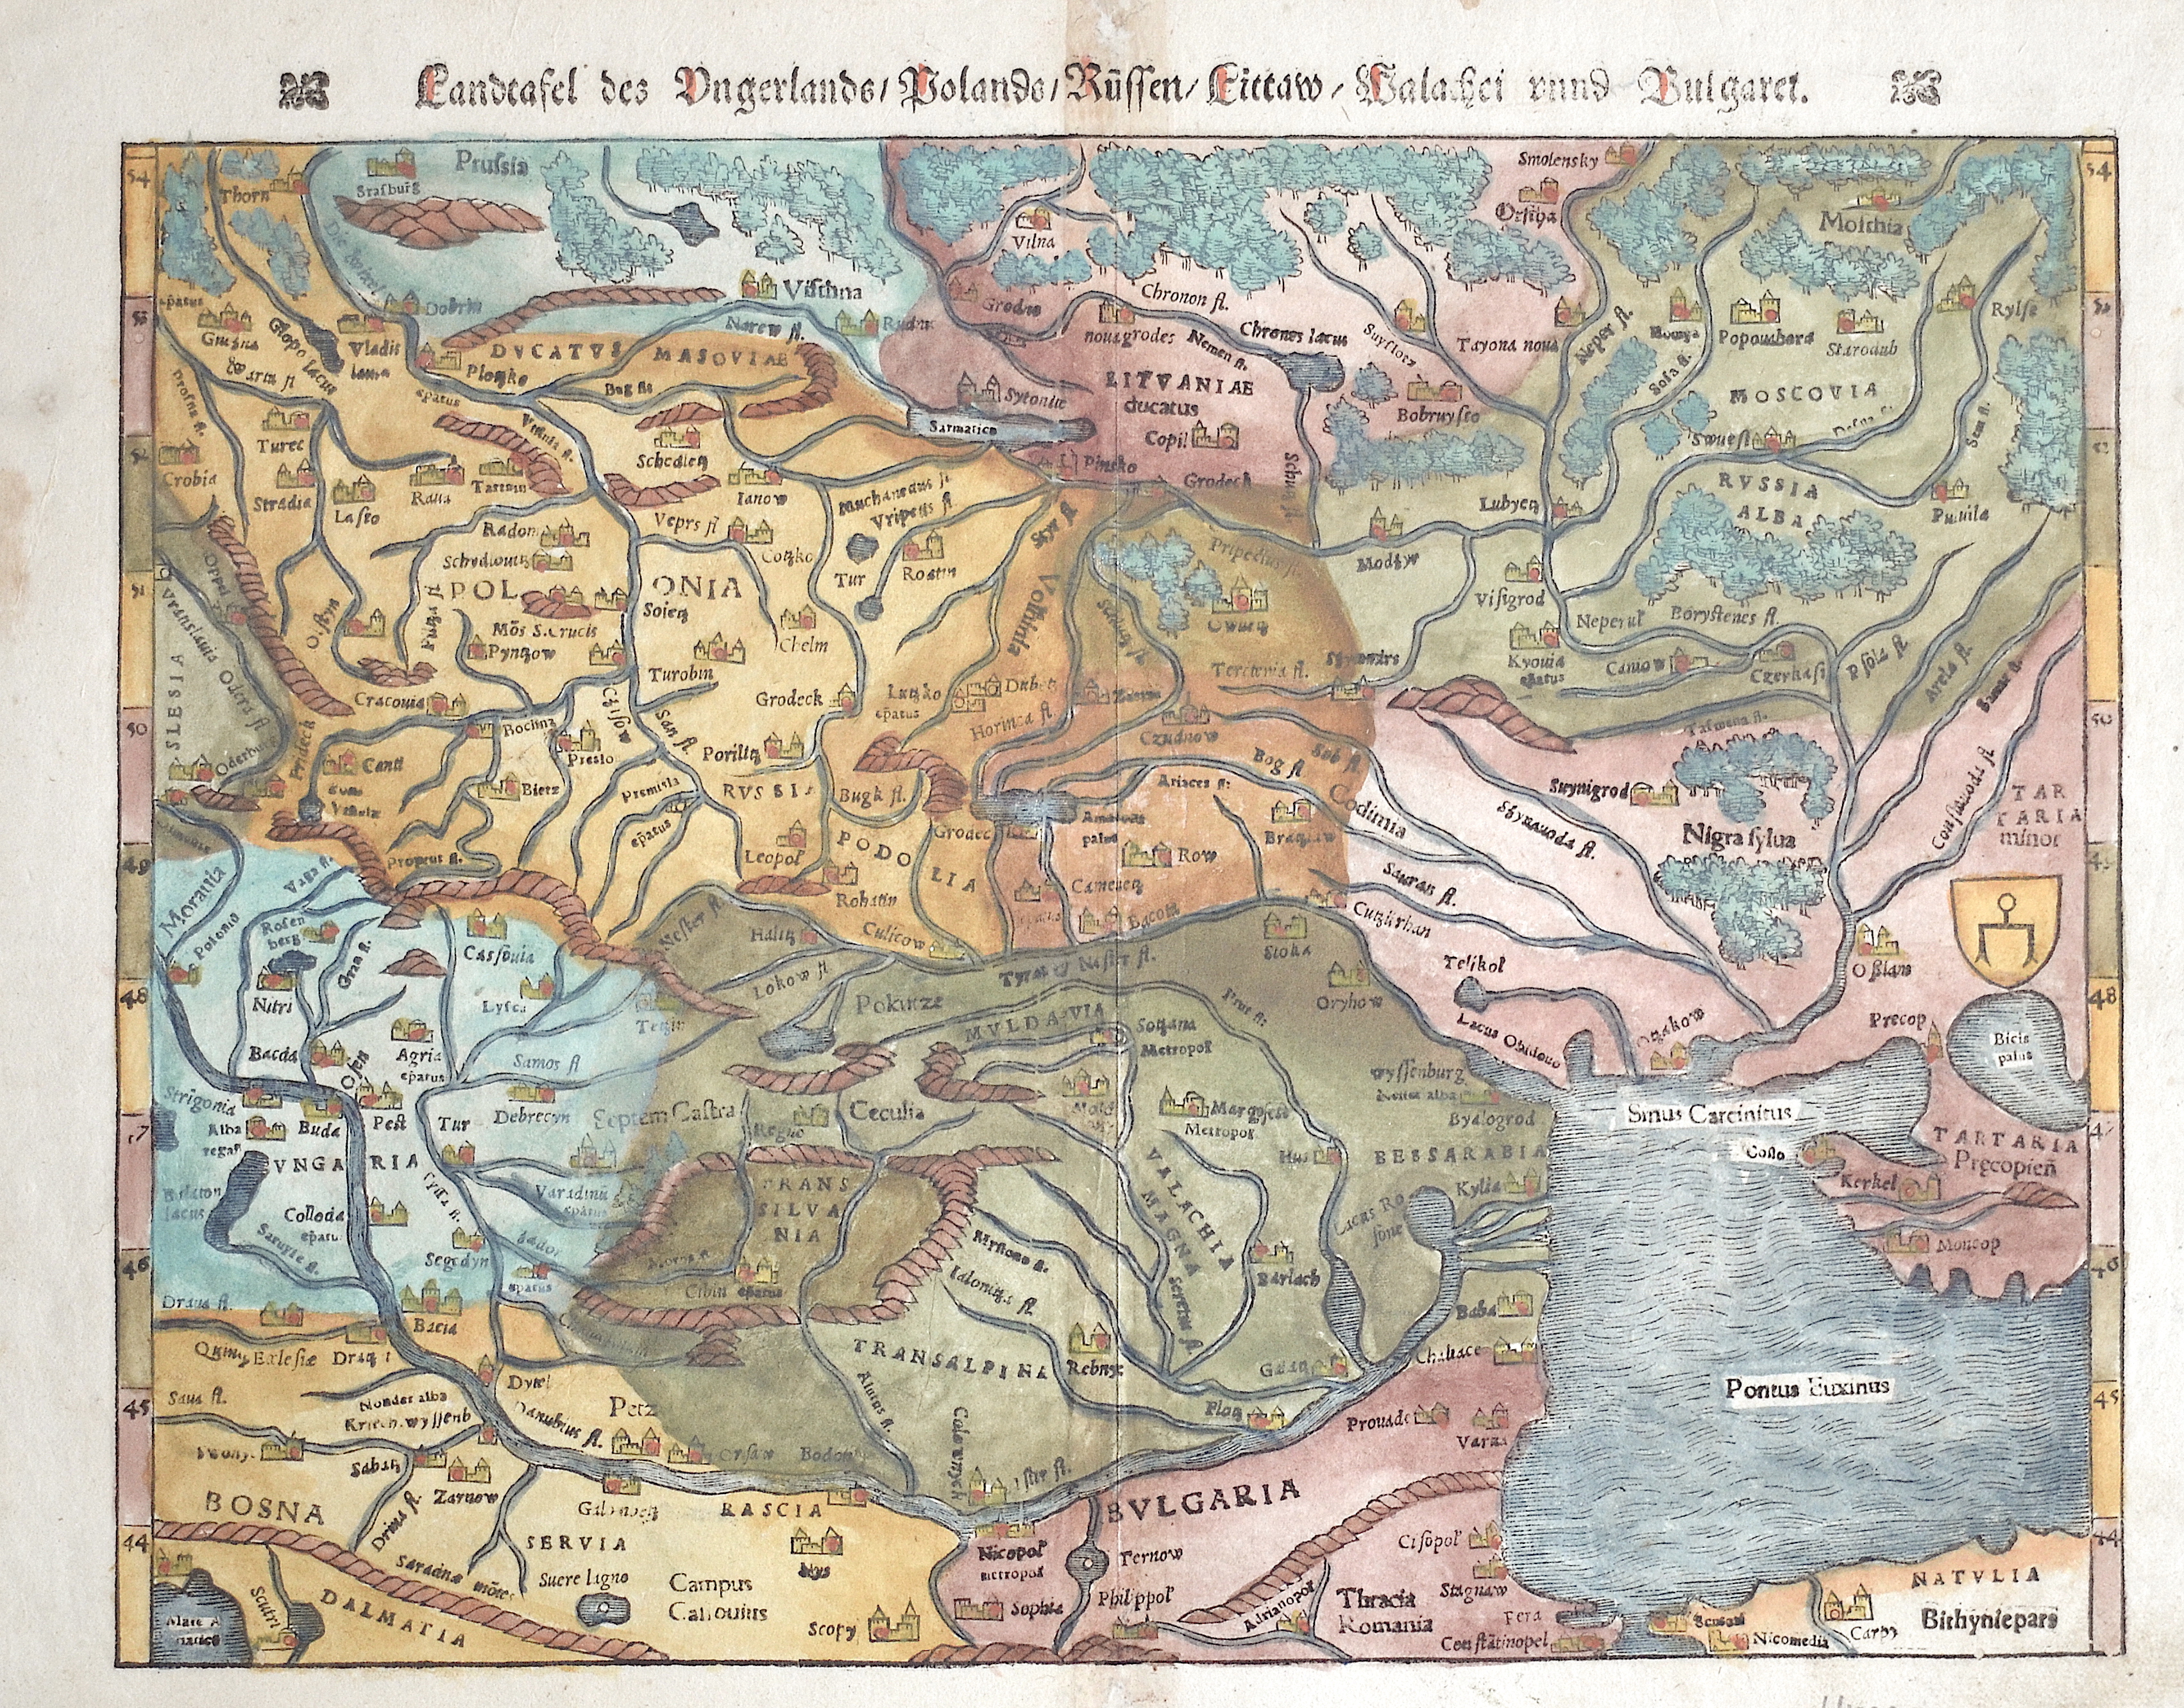 Ptolemy/Münster Sebastian  Landtafel des Ungerlands/Polands/Reussen/Littaw/Walachei und Bulgarei